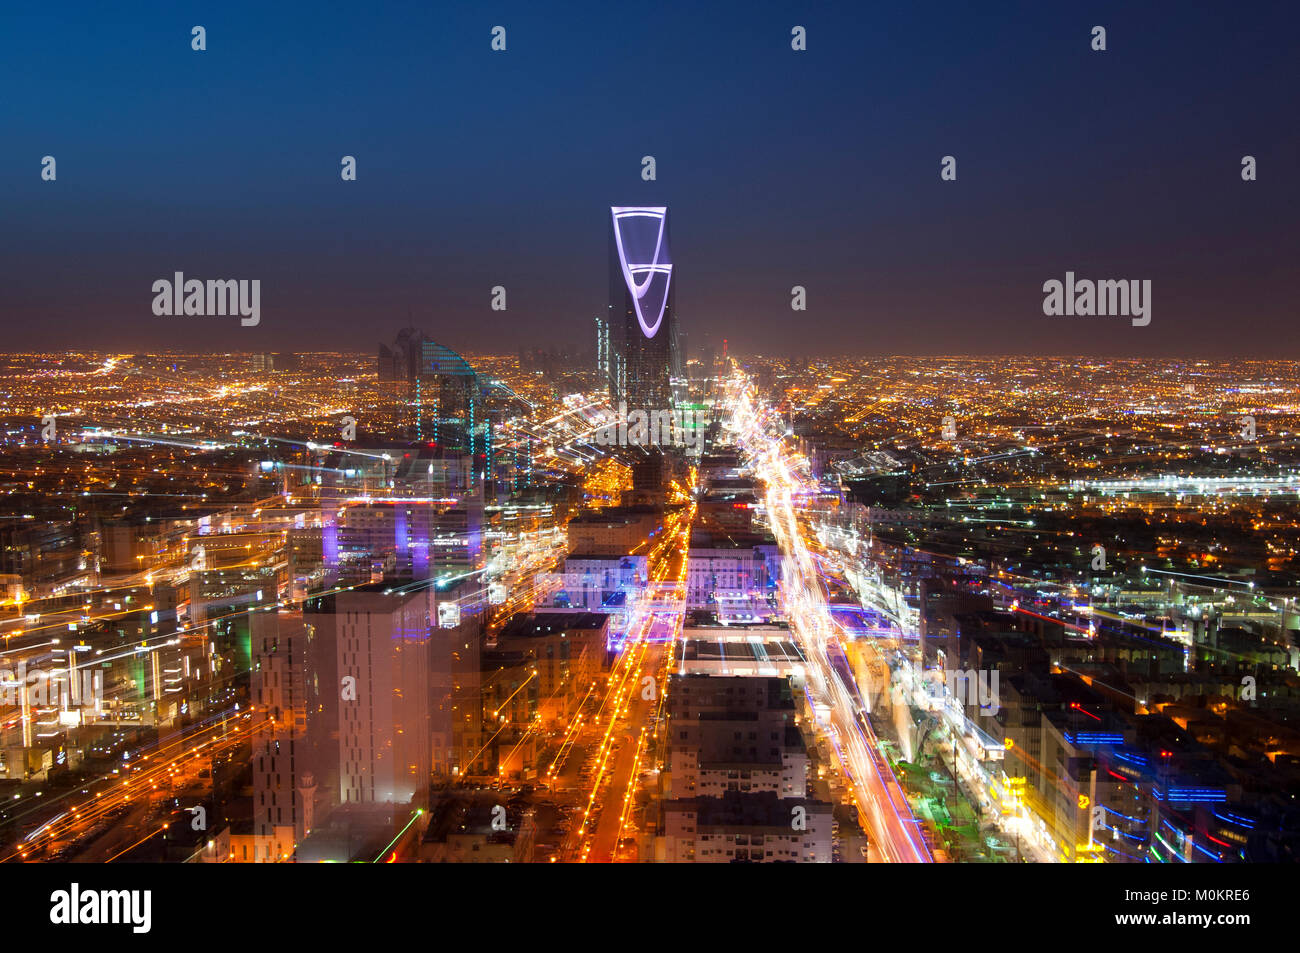 Riyadh skyline notturno n. 3 Immagini Stock